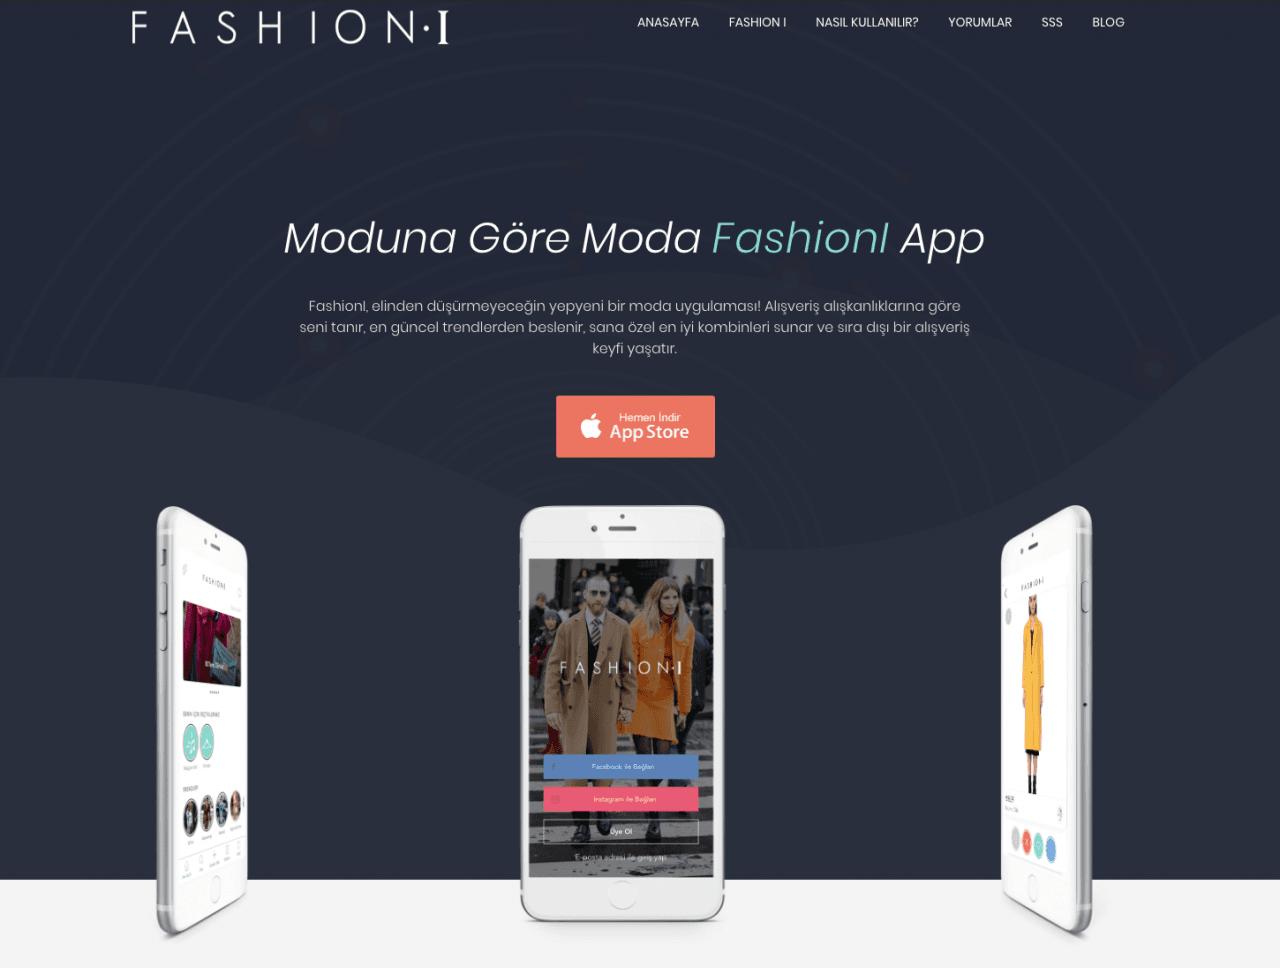 Moduna Göre Moda FashionI App